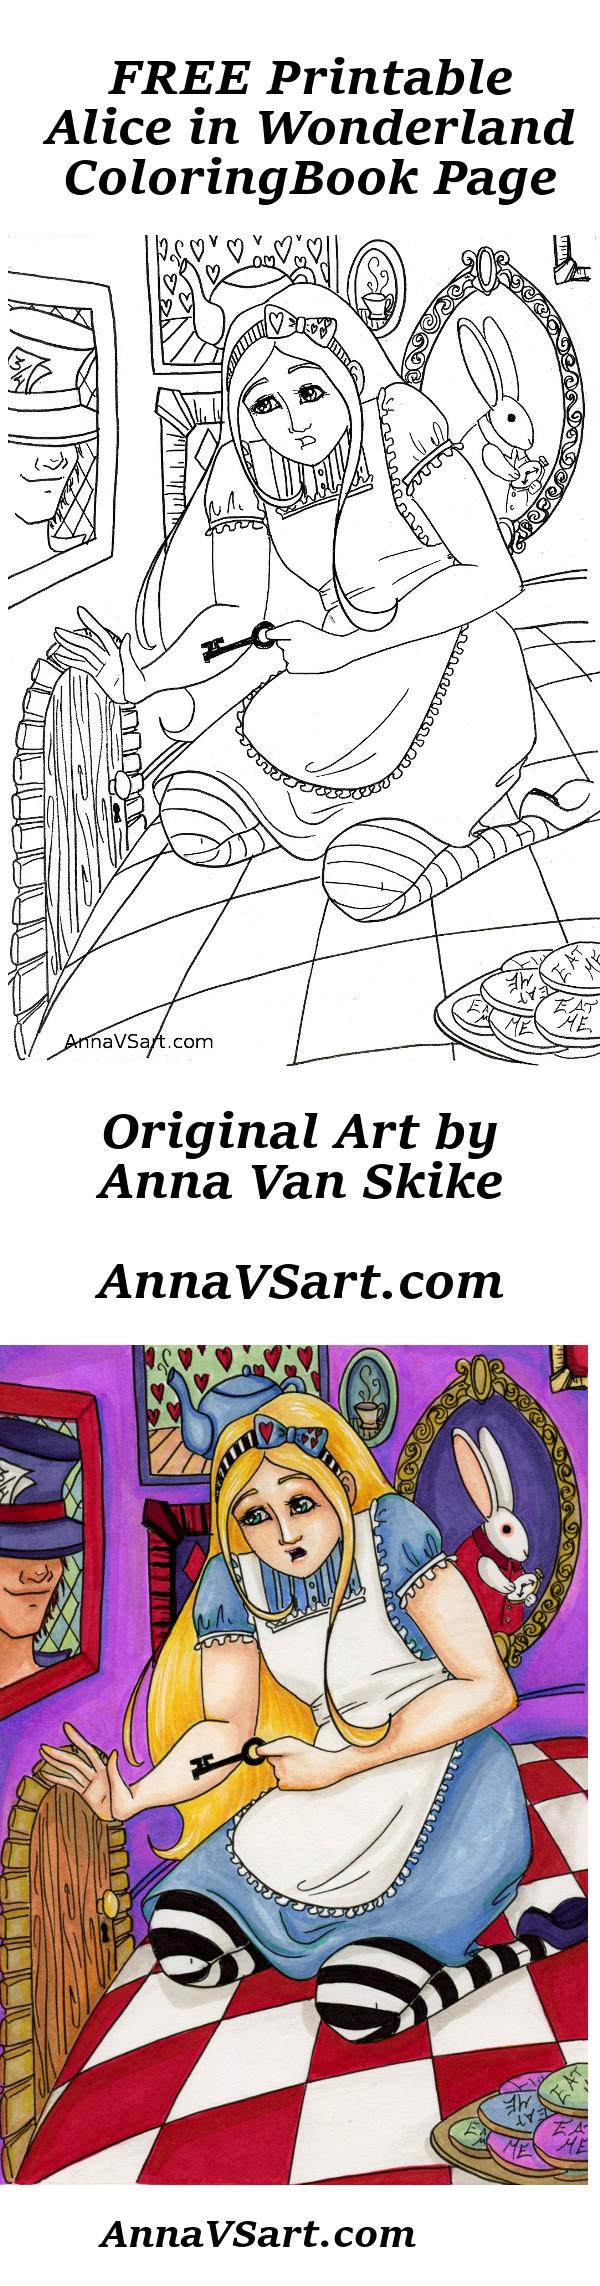 Alice in Wonderland Free Printable Coloring Book Page